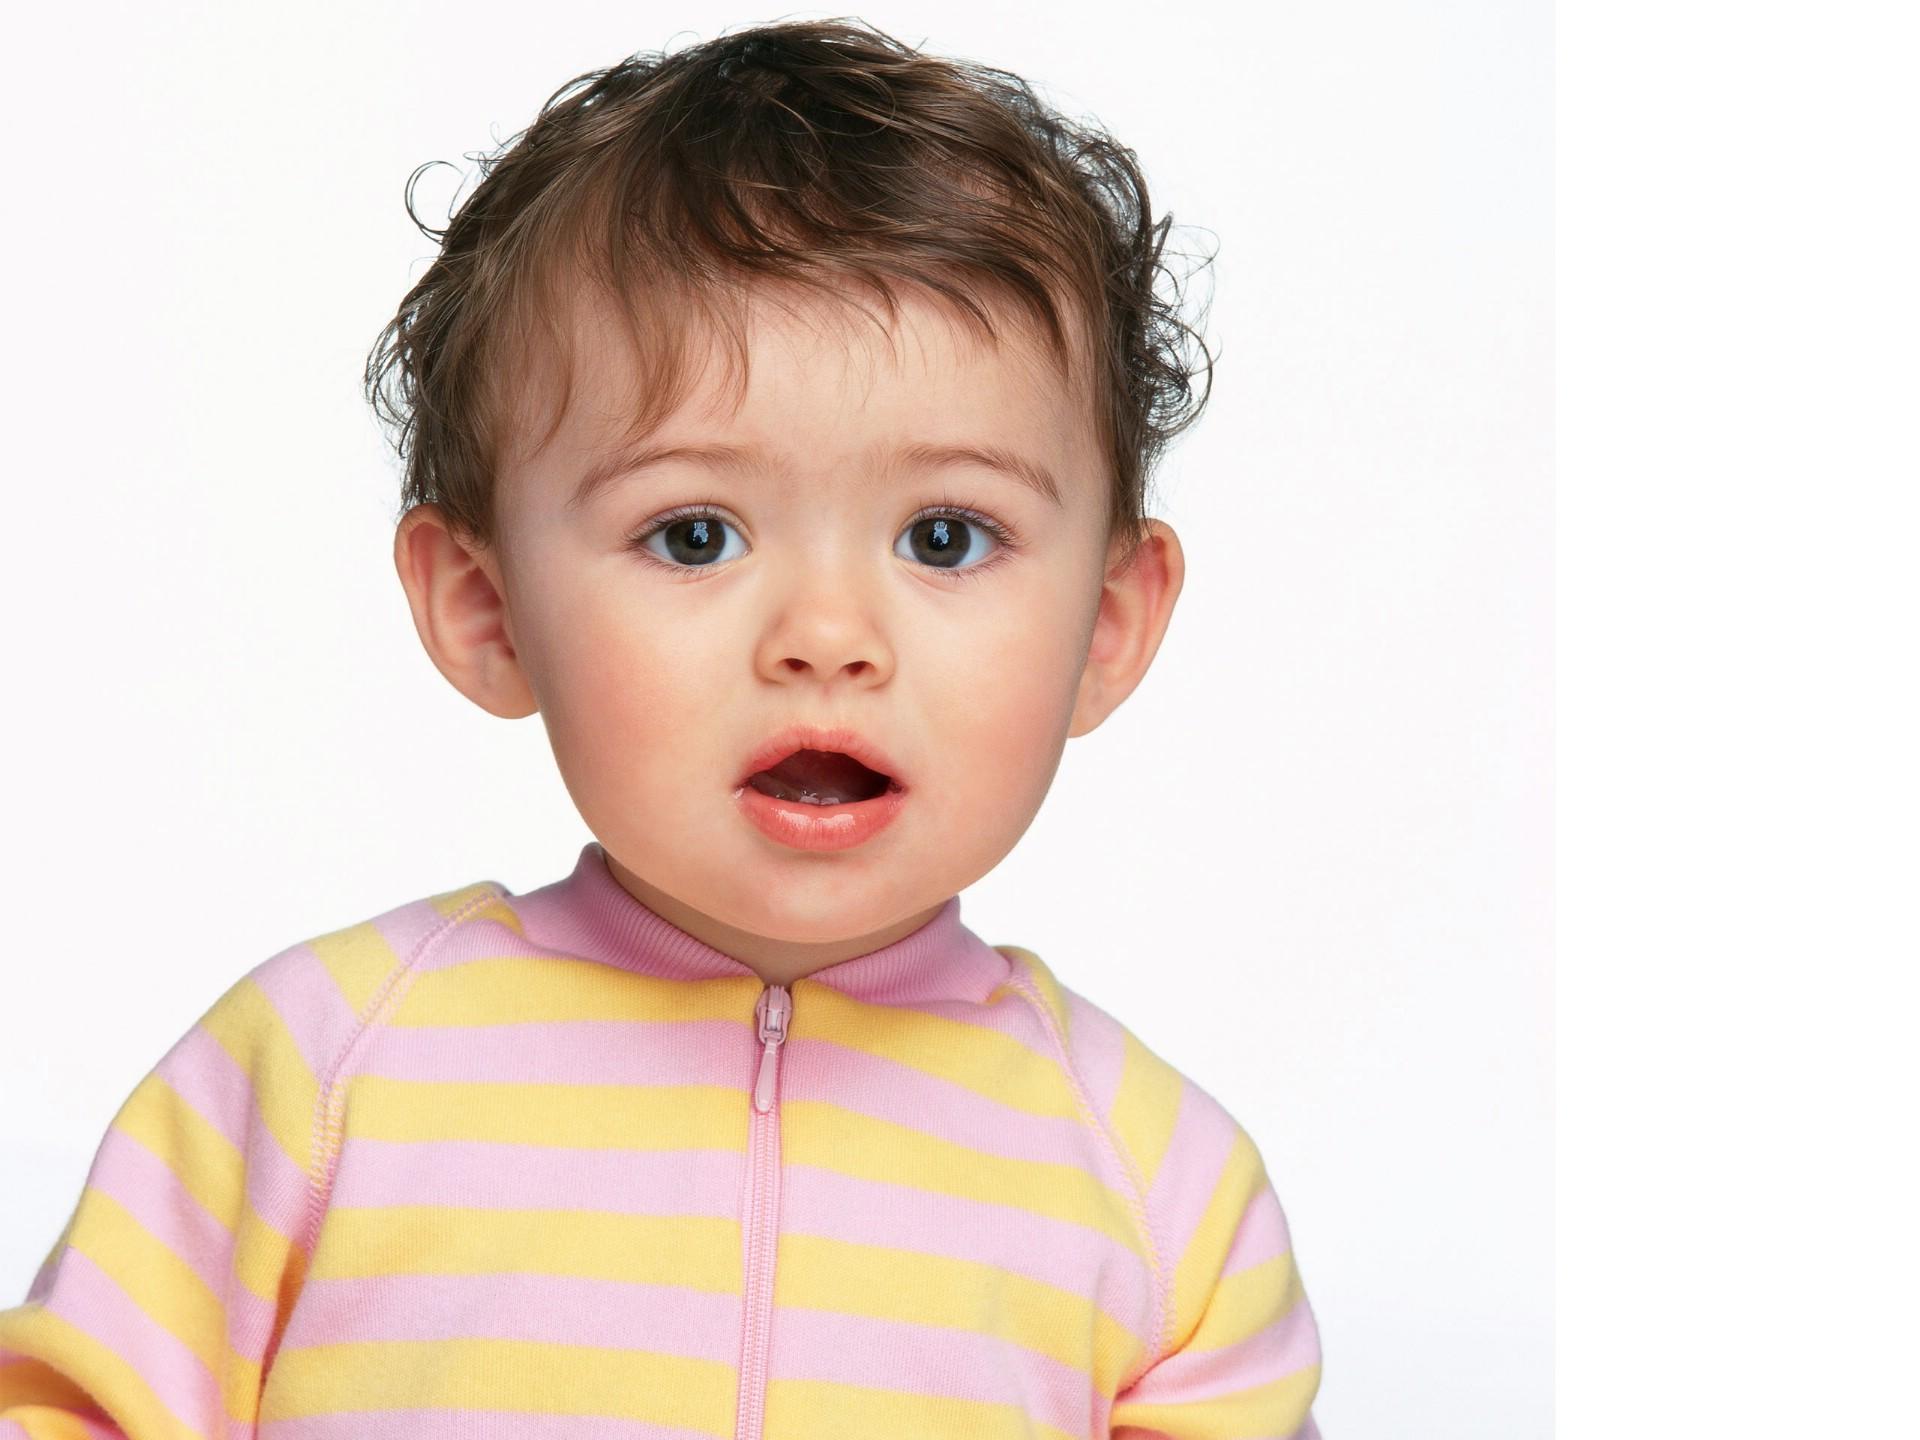 HD Wallpapers Cute Little Babies HQ